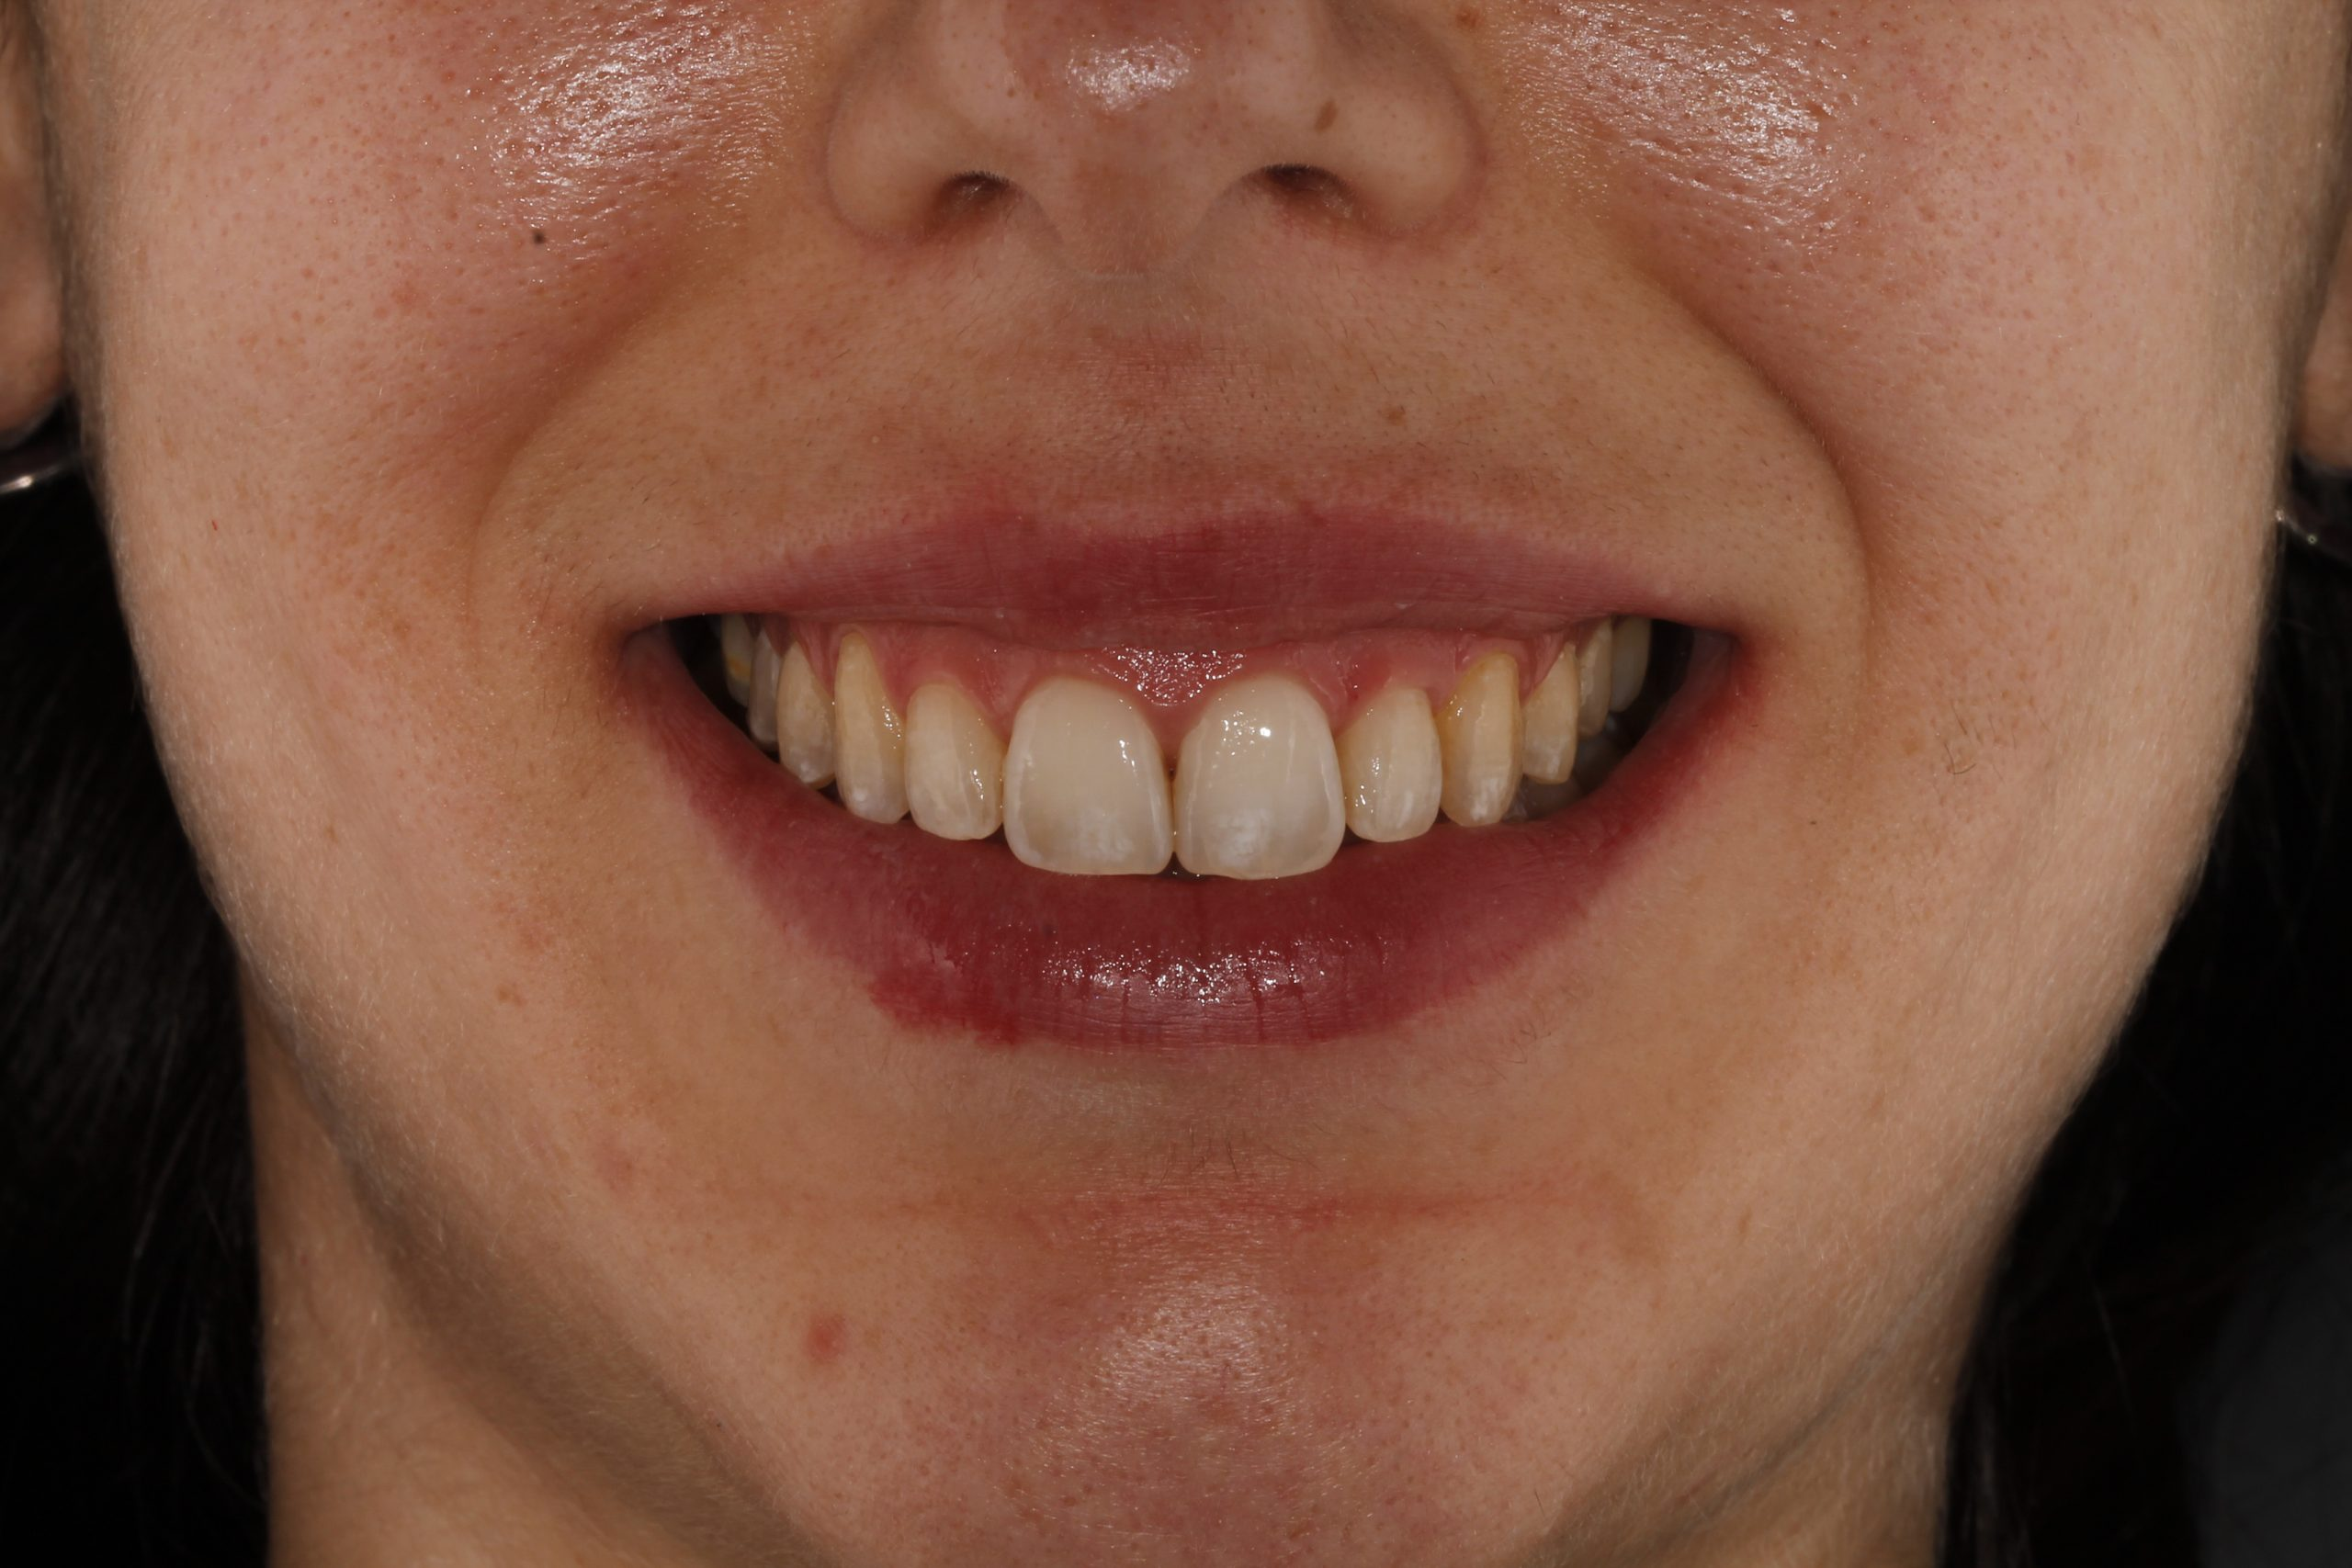 Sonrisa gingival corregida con ortodoncia invisible